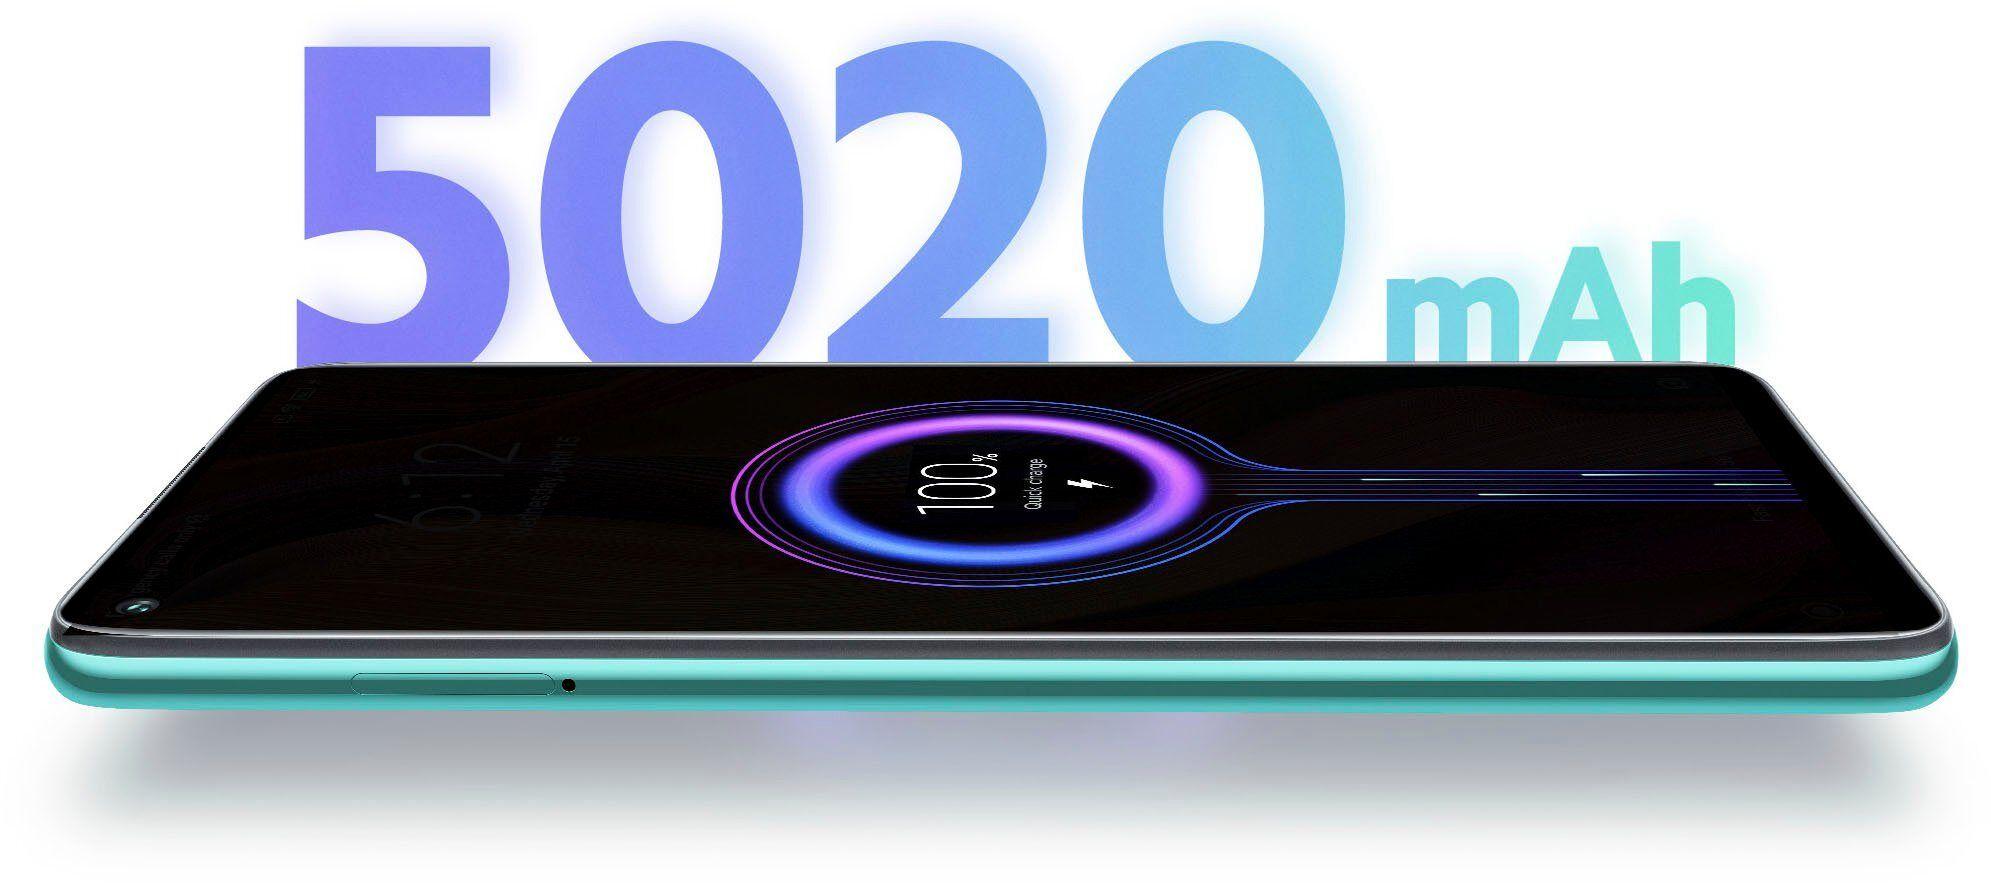 Xiaomi Redmi Note 9 Smartphone (16,6 cm/6,53 Zoll, 128 GB Speicherplatz, 48 MP Kamera), Forest Green